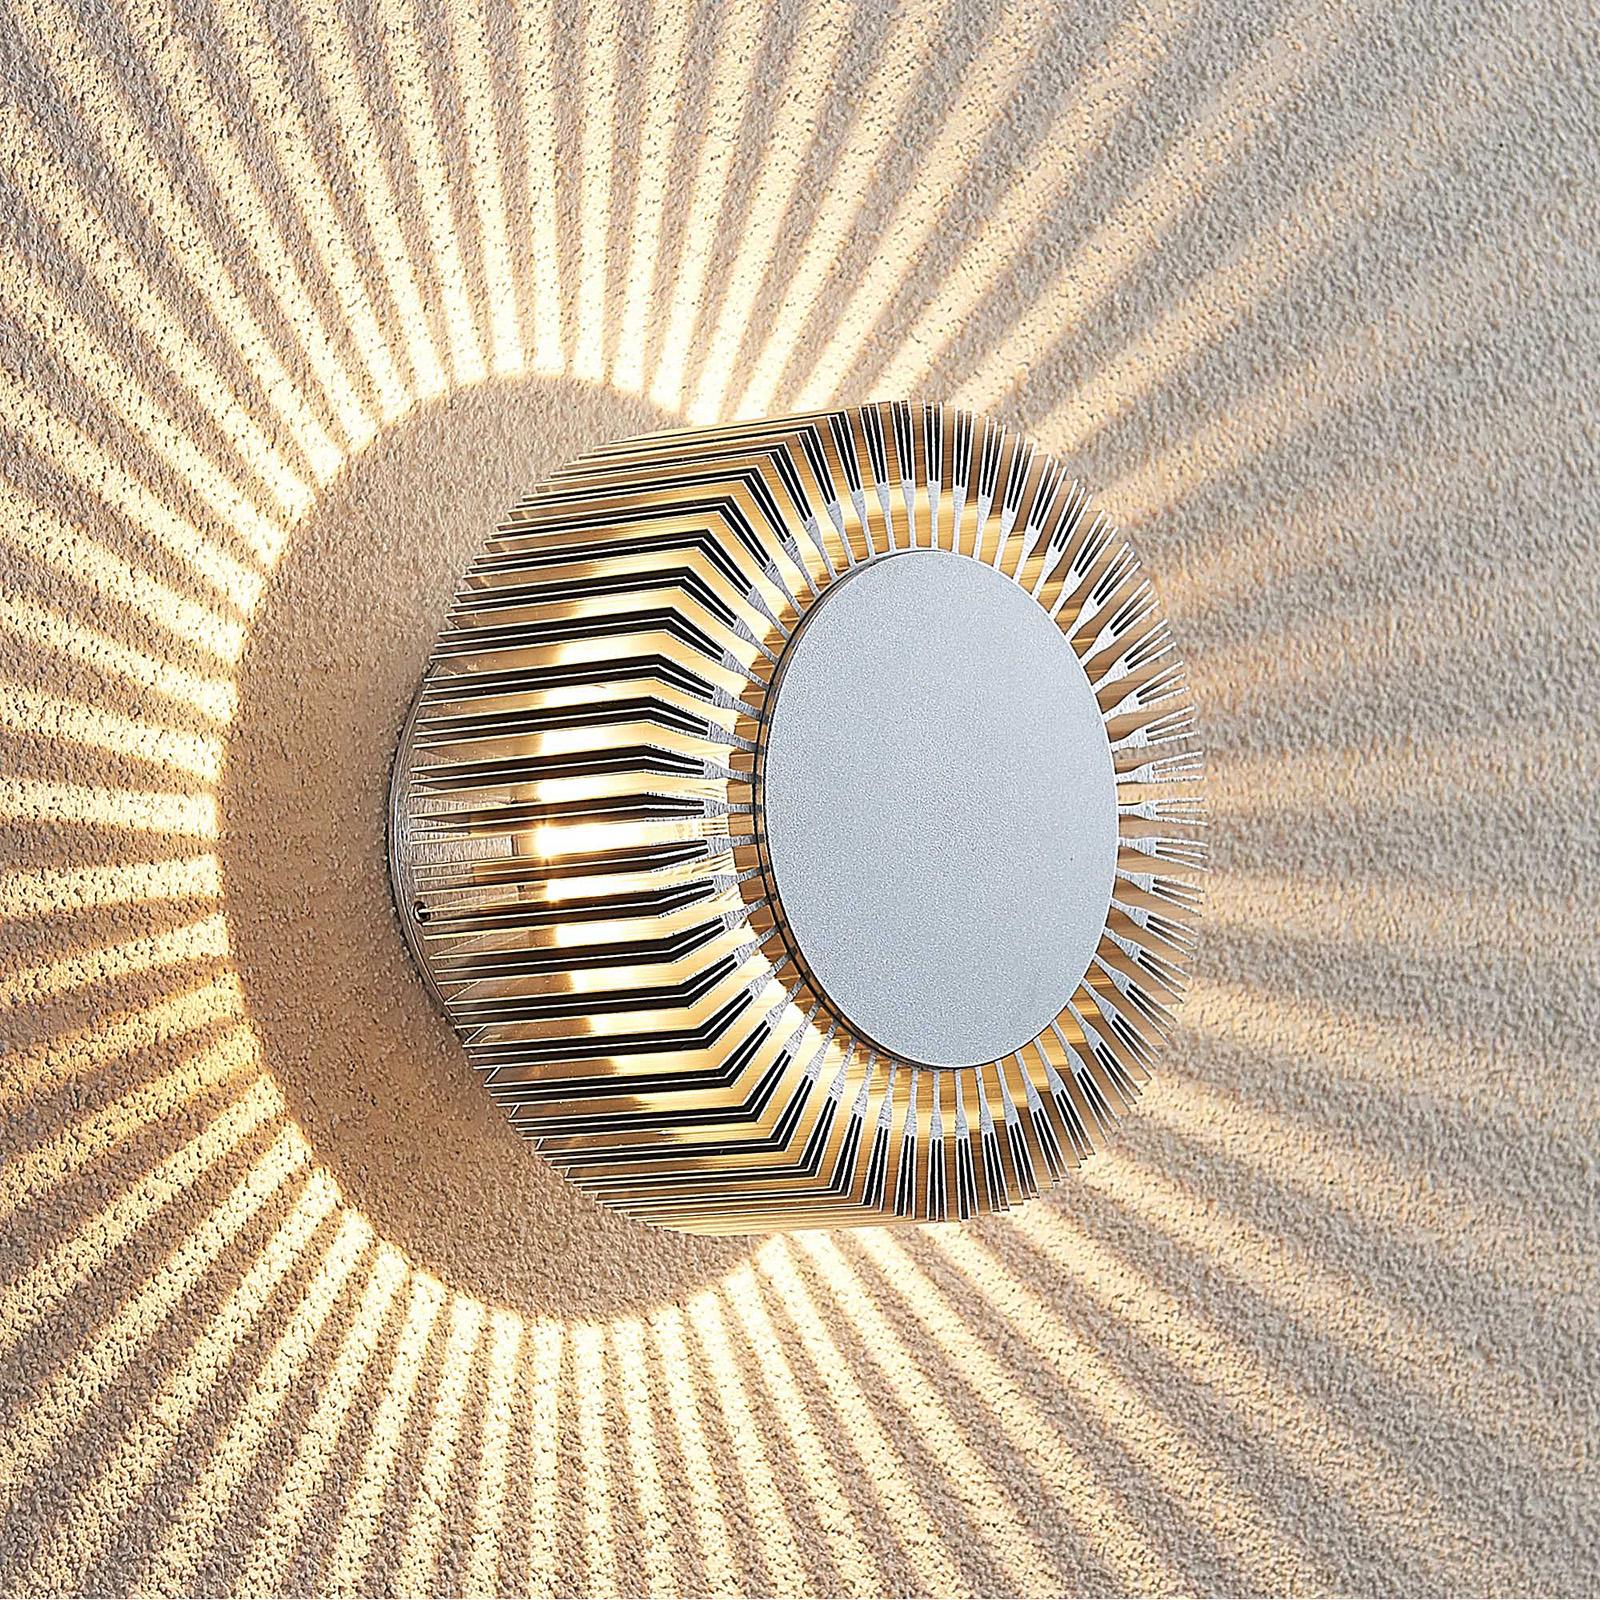 Lucande Keany LED-Außenwandlampe, Strahlenkranz